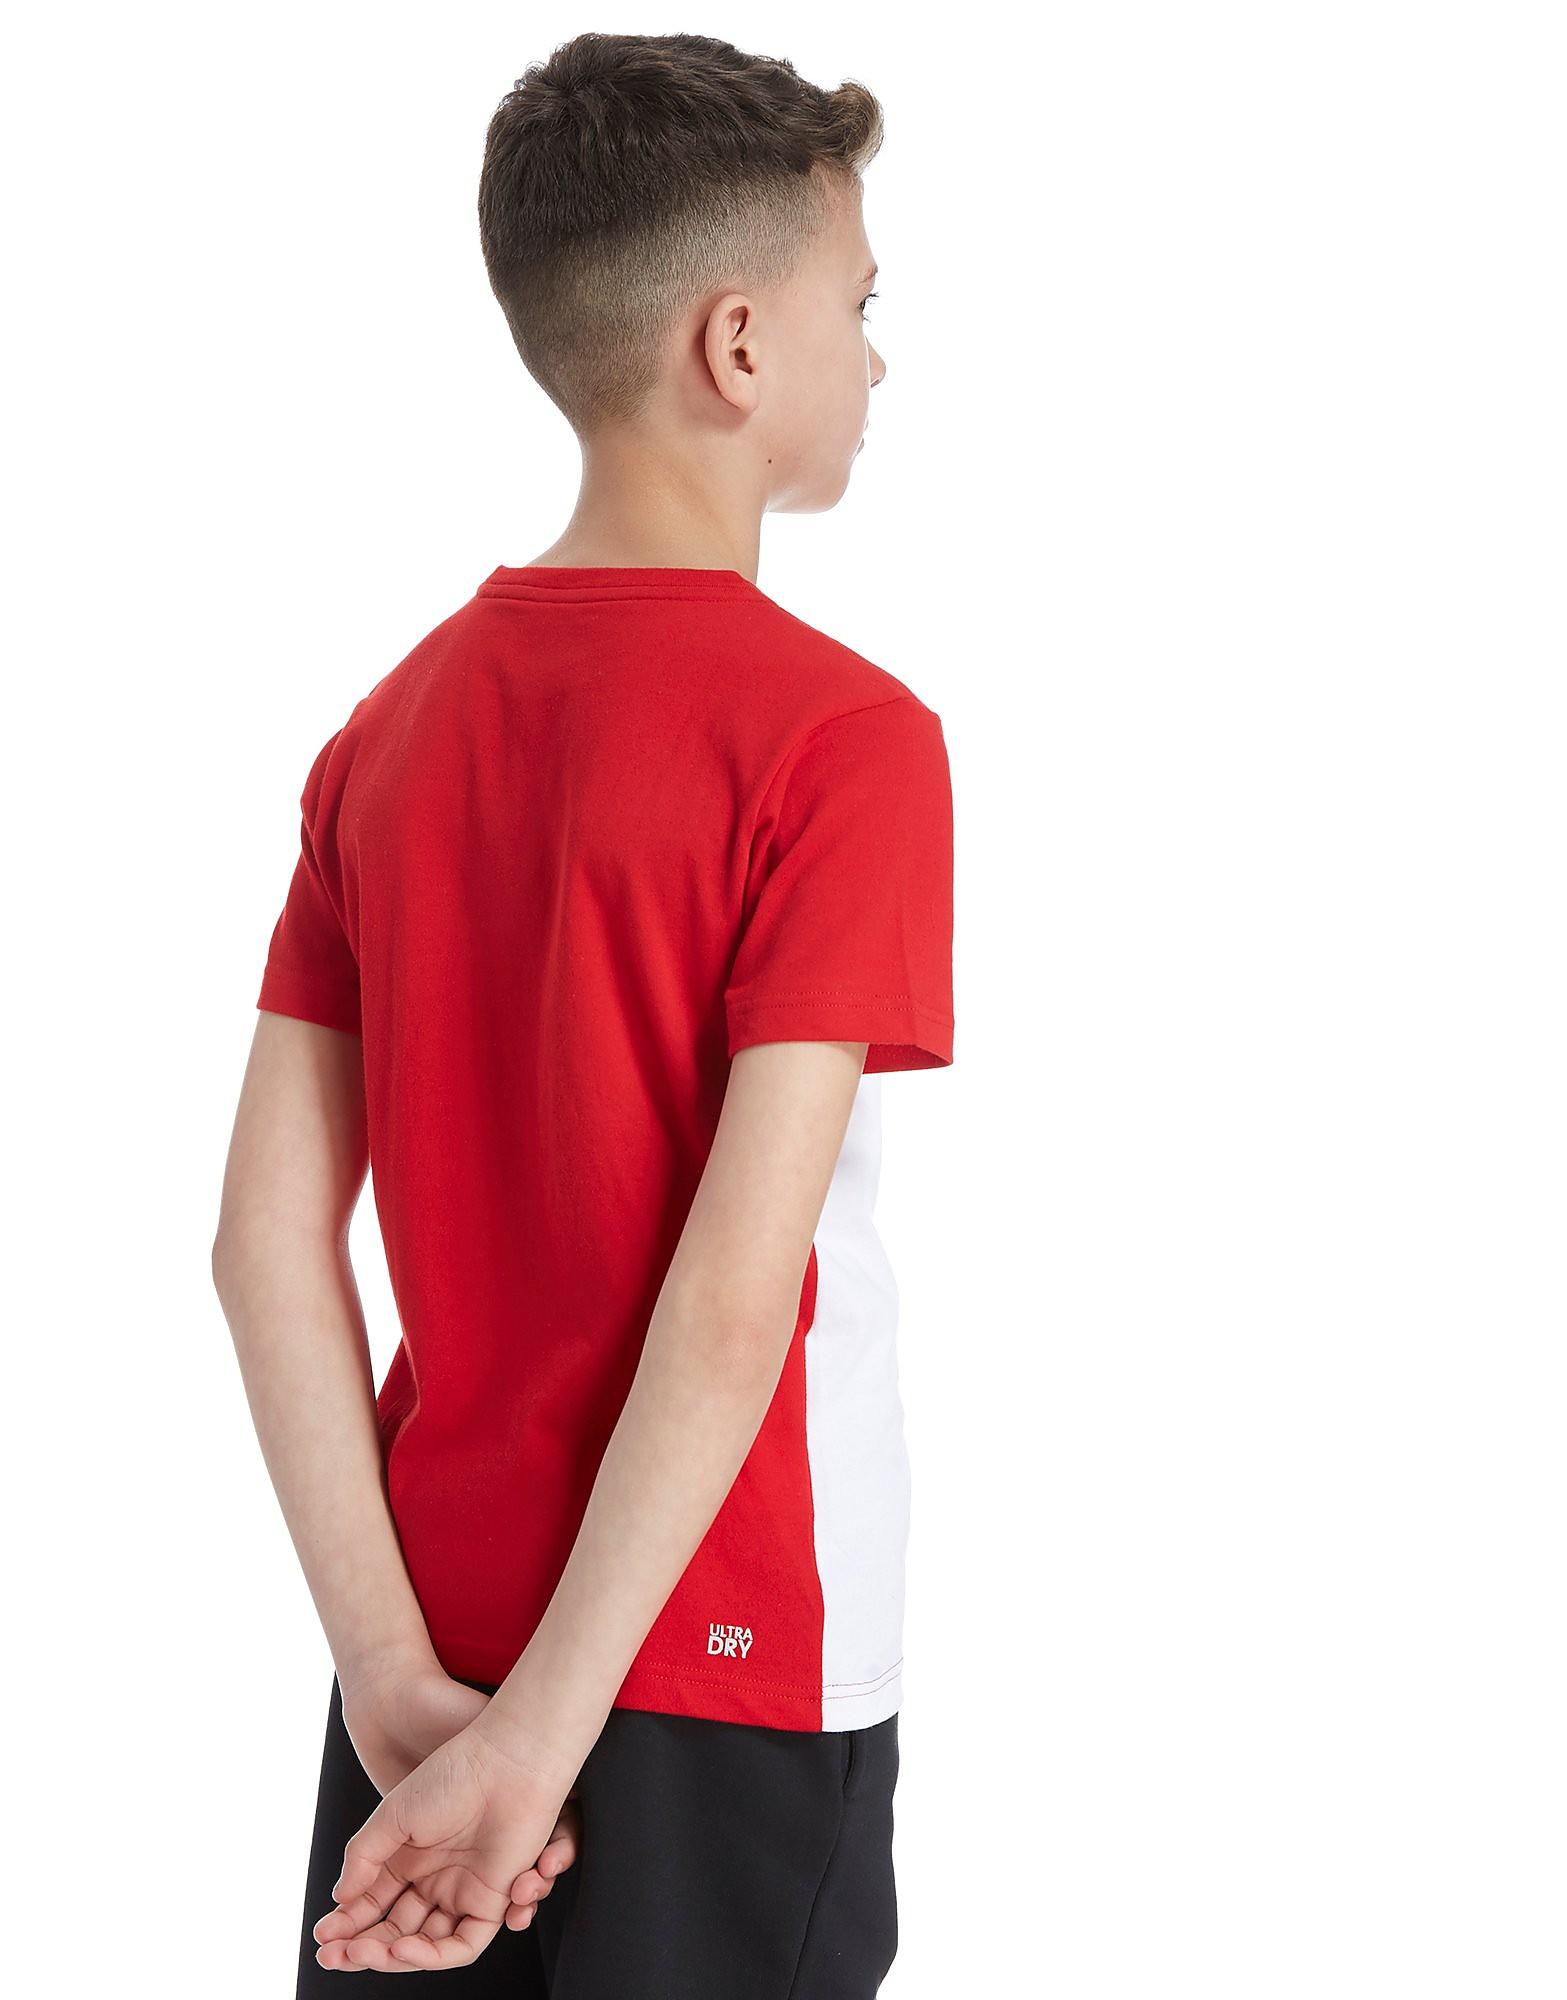 Lacoste T-shirt Colourblock T-Shirt Junior